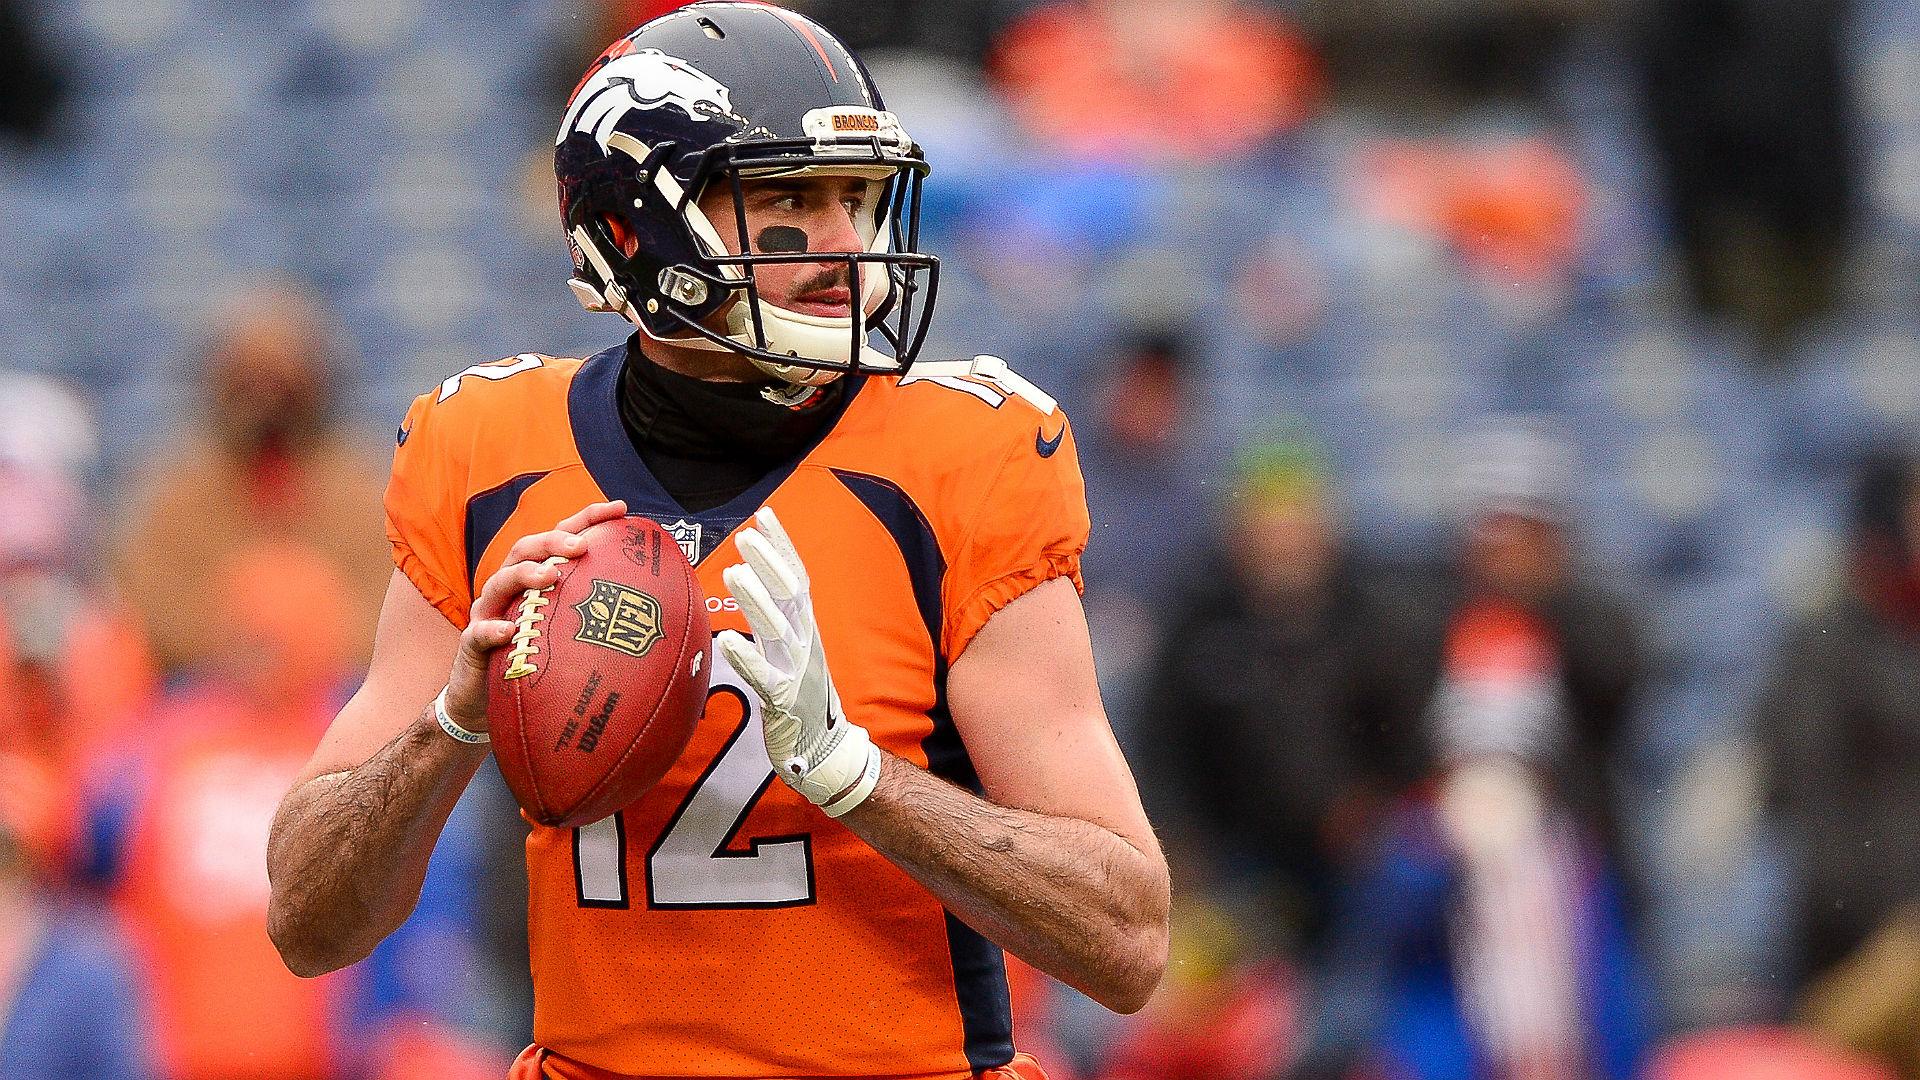 Paxton Lynch demoted to Broncos third-string quarterback after preseason struggles